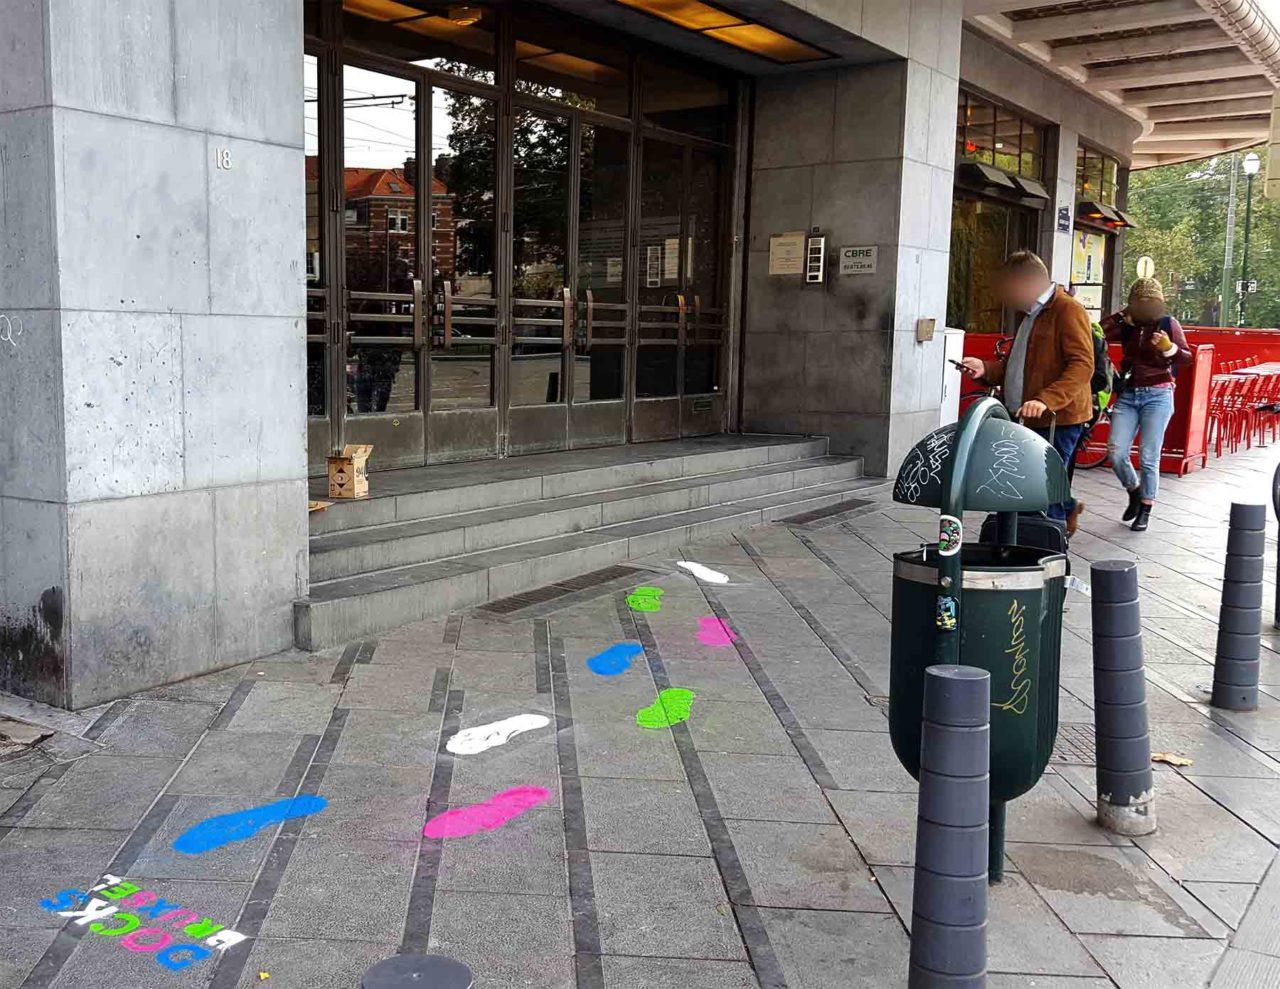 propaganza-guerilla-marketting-peinture-sol-spraypaint-ground-jeu-piste-docks-bruxsel-2-1280x989.jpg